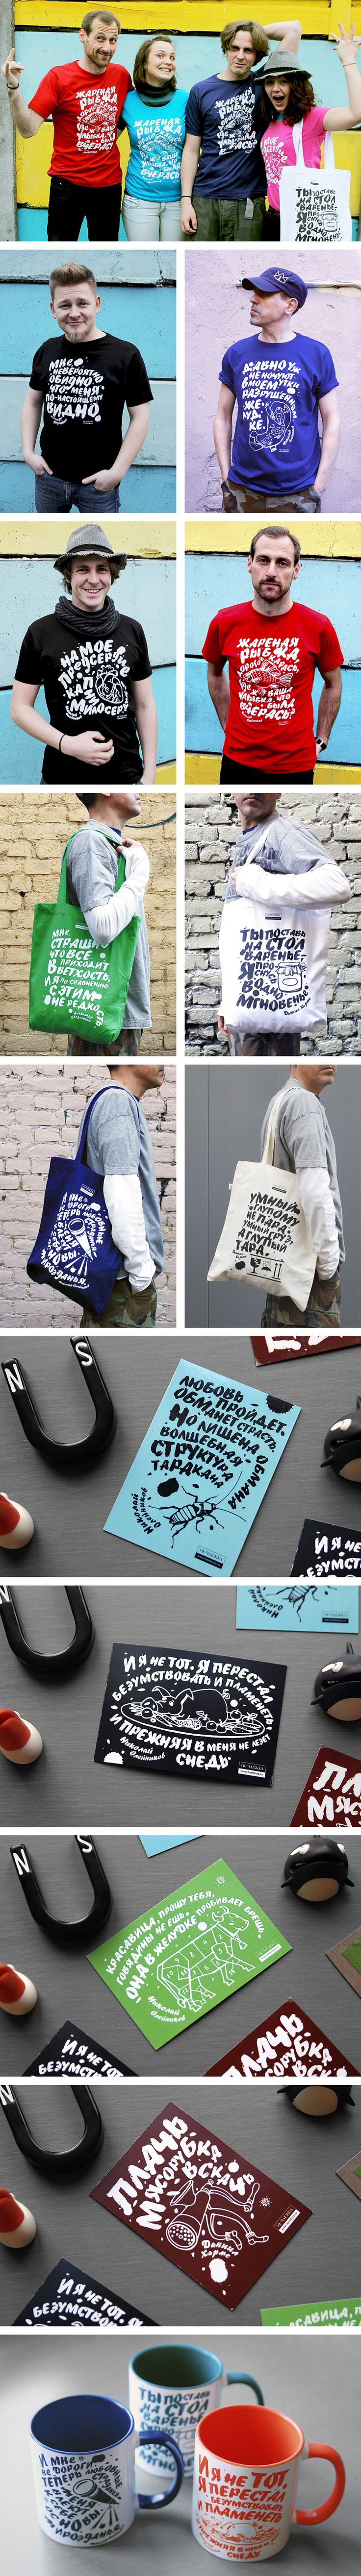 "Gifts Set of the St. Petersburg regional ""Nochlezhka"" charitable public organization."